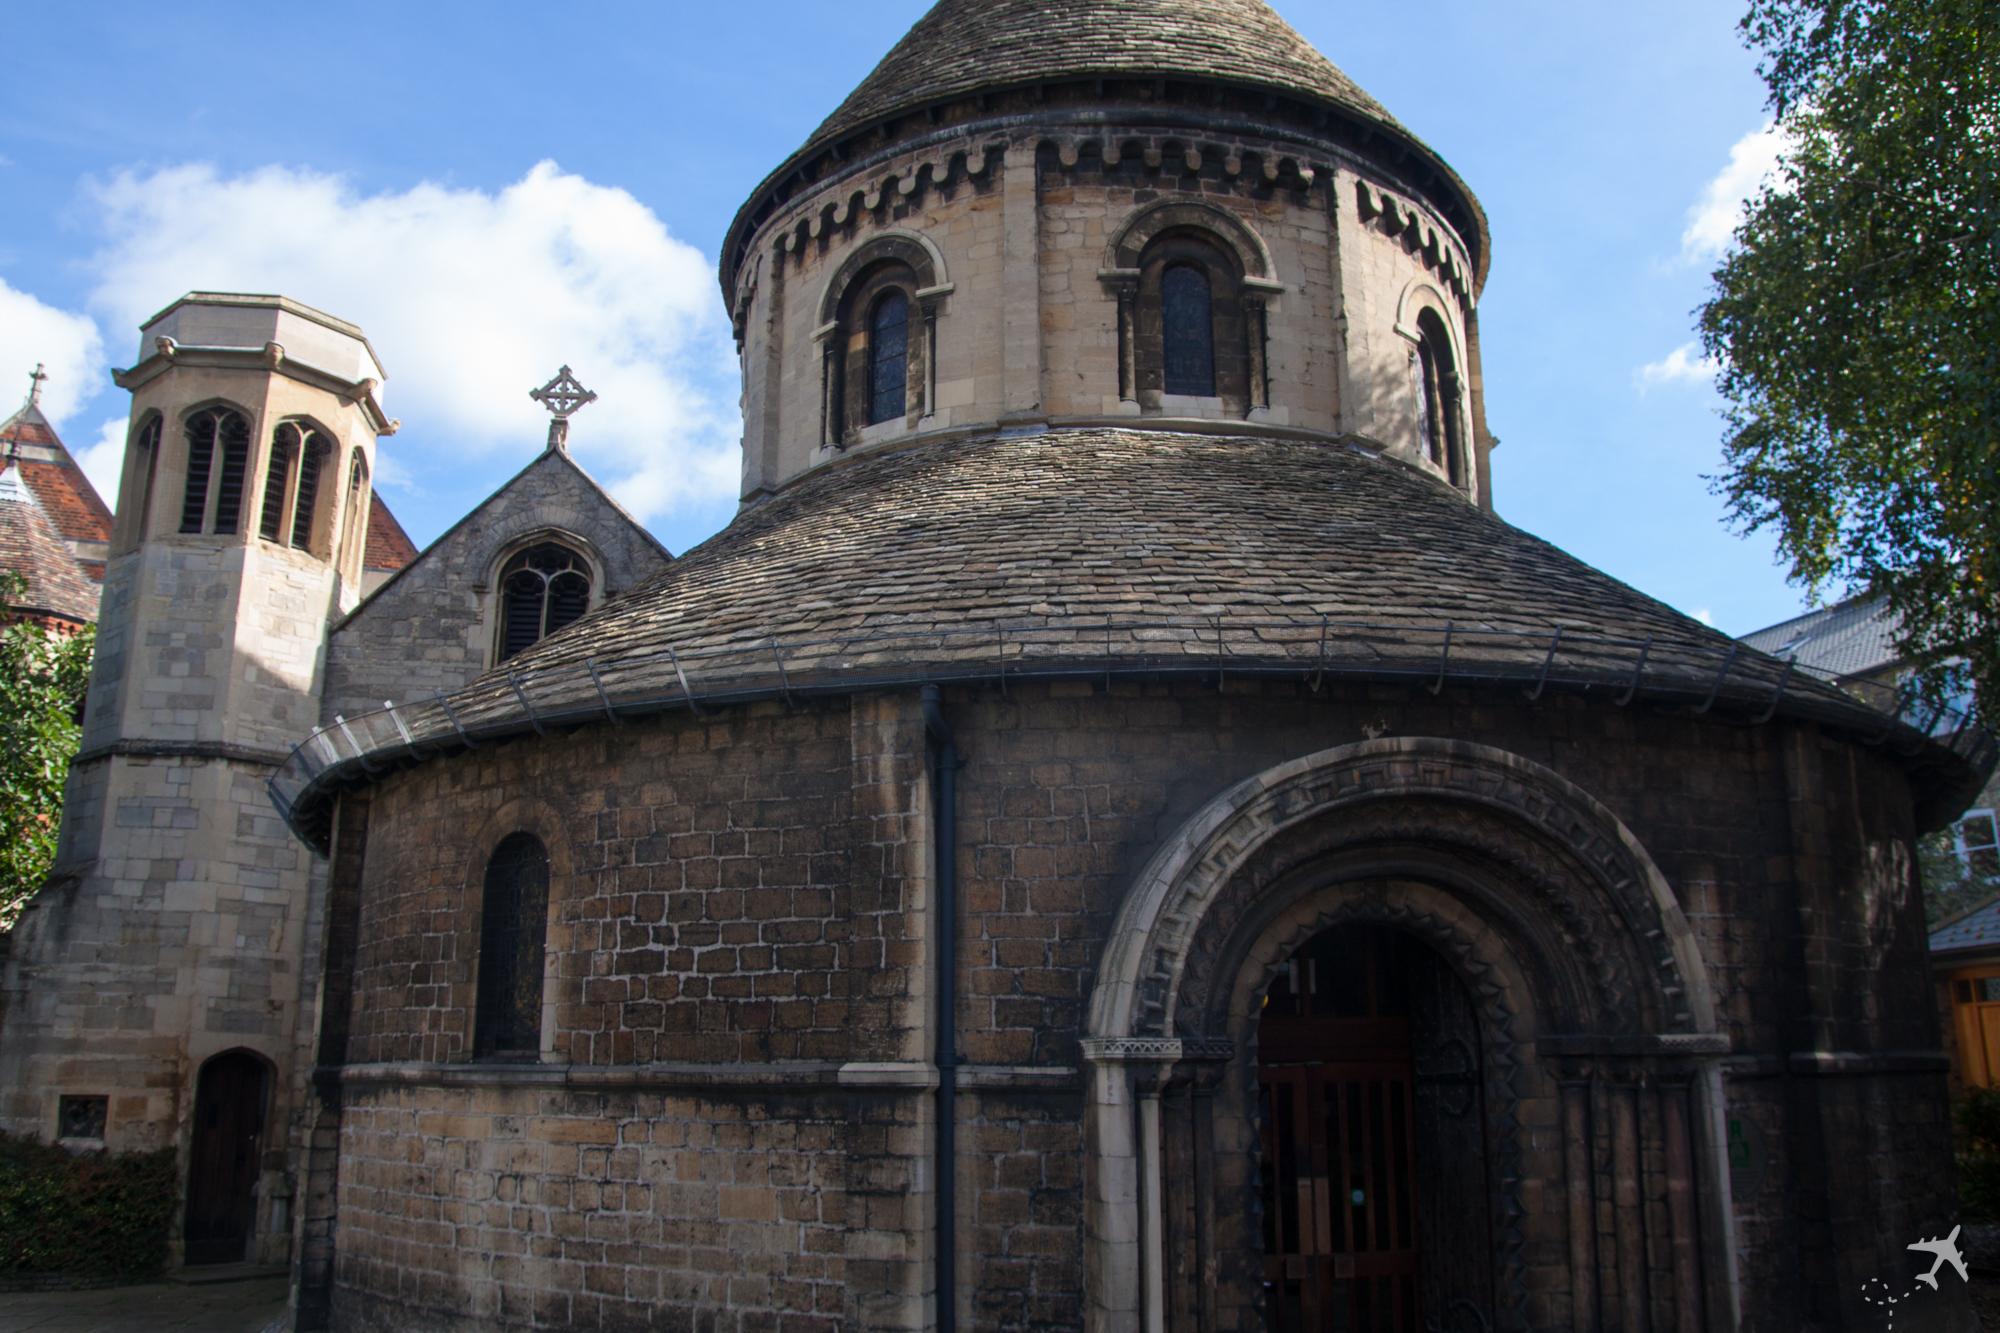 Round Church - Church of the Holy Sepulchre, Cambringe, Großbri